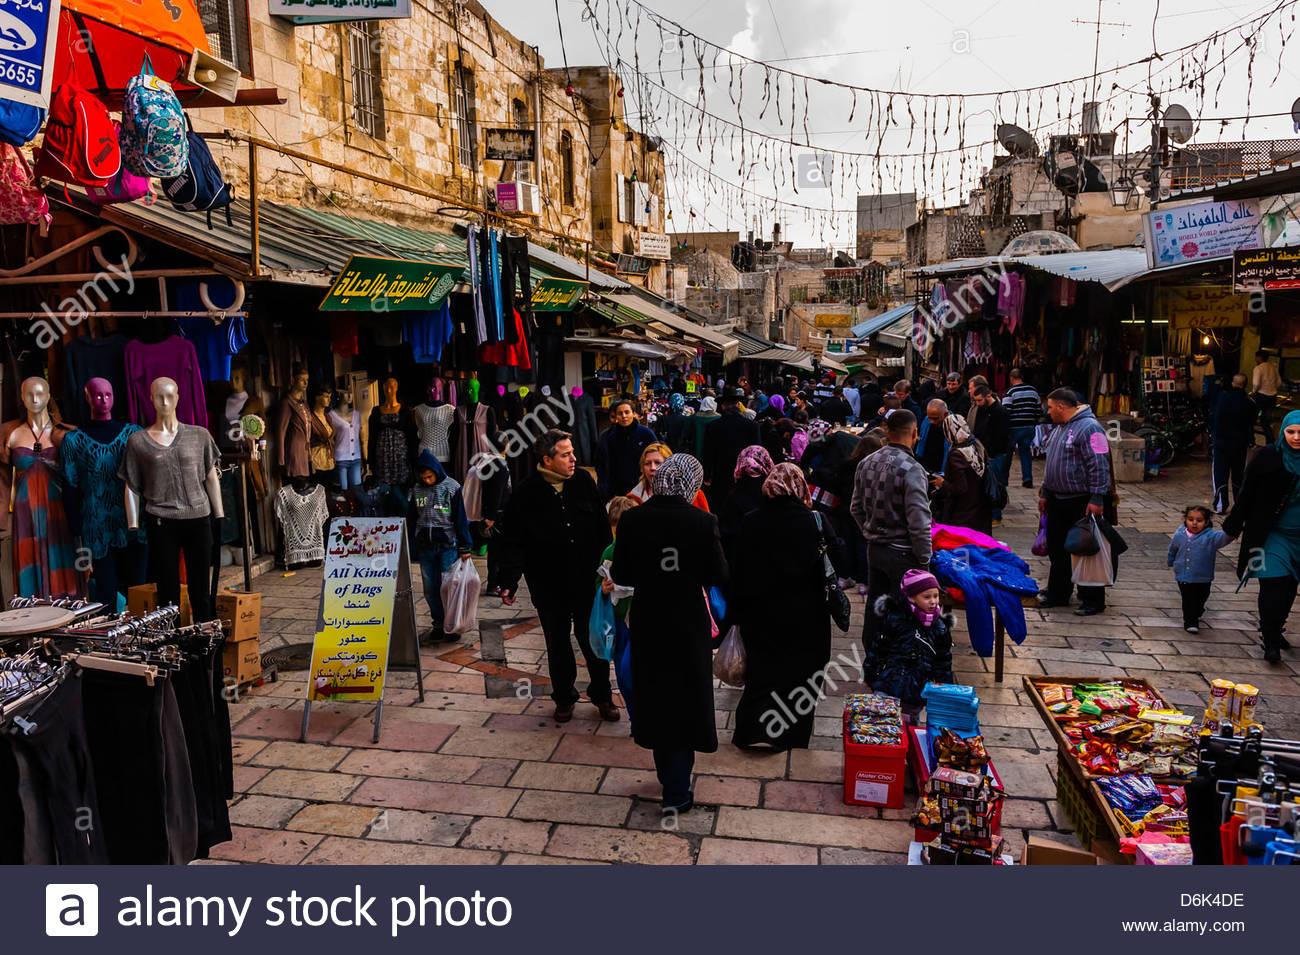 Street market on El Wad Road in the Old City, Jerusalem, Israel. - Stock Image